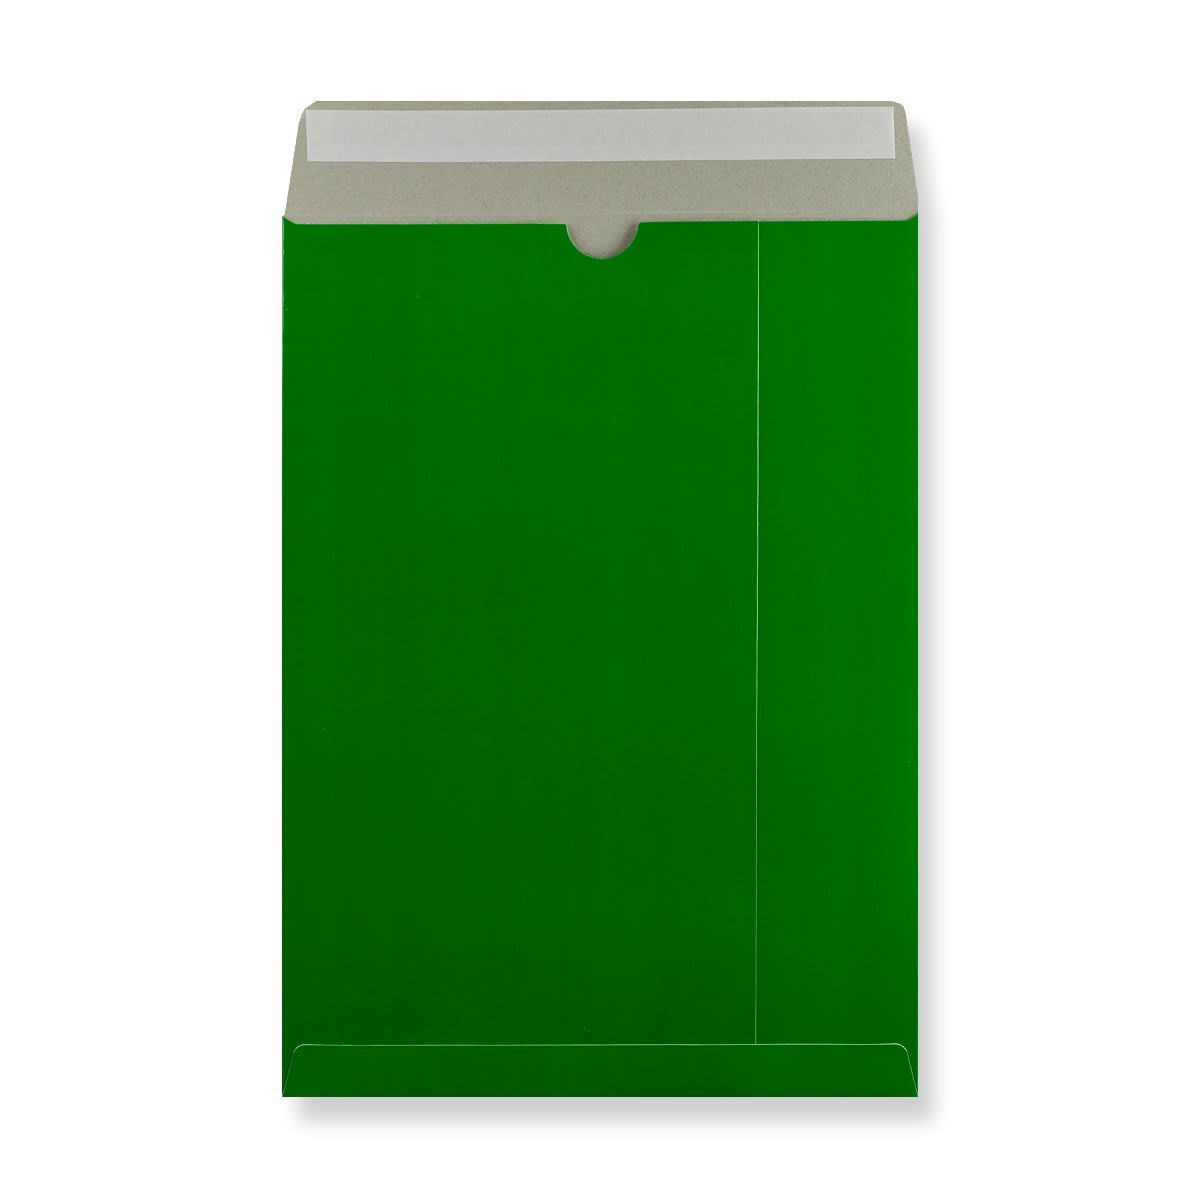 C3 GREEN ALL BOARD ENVELOPES